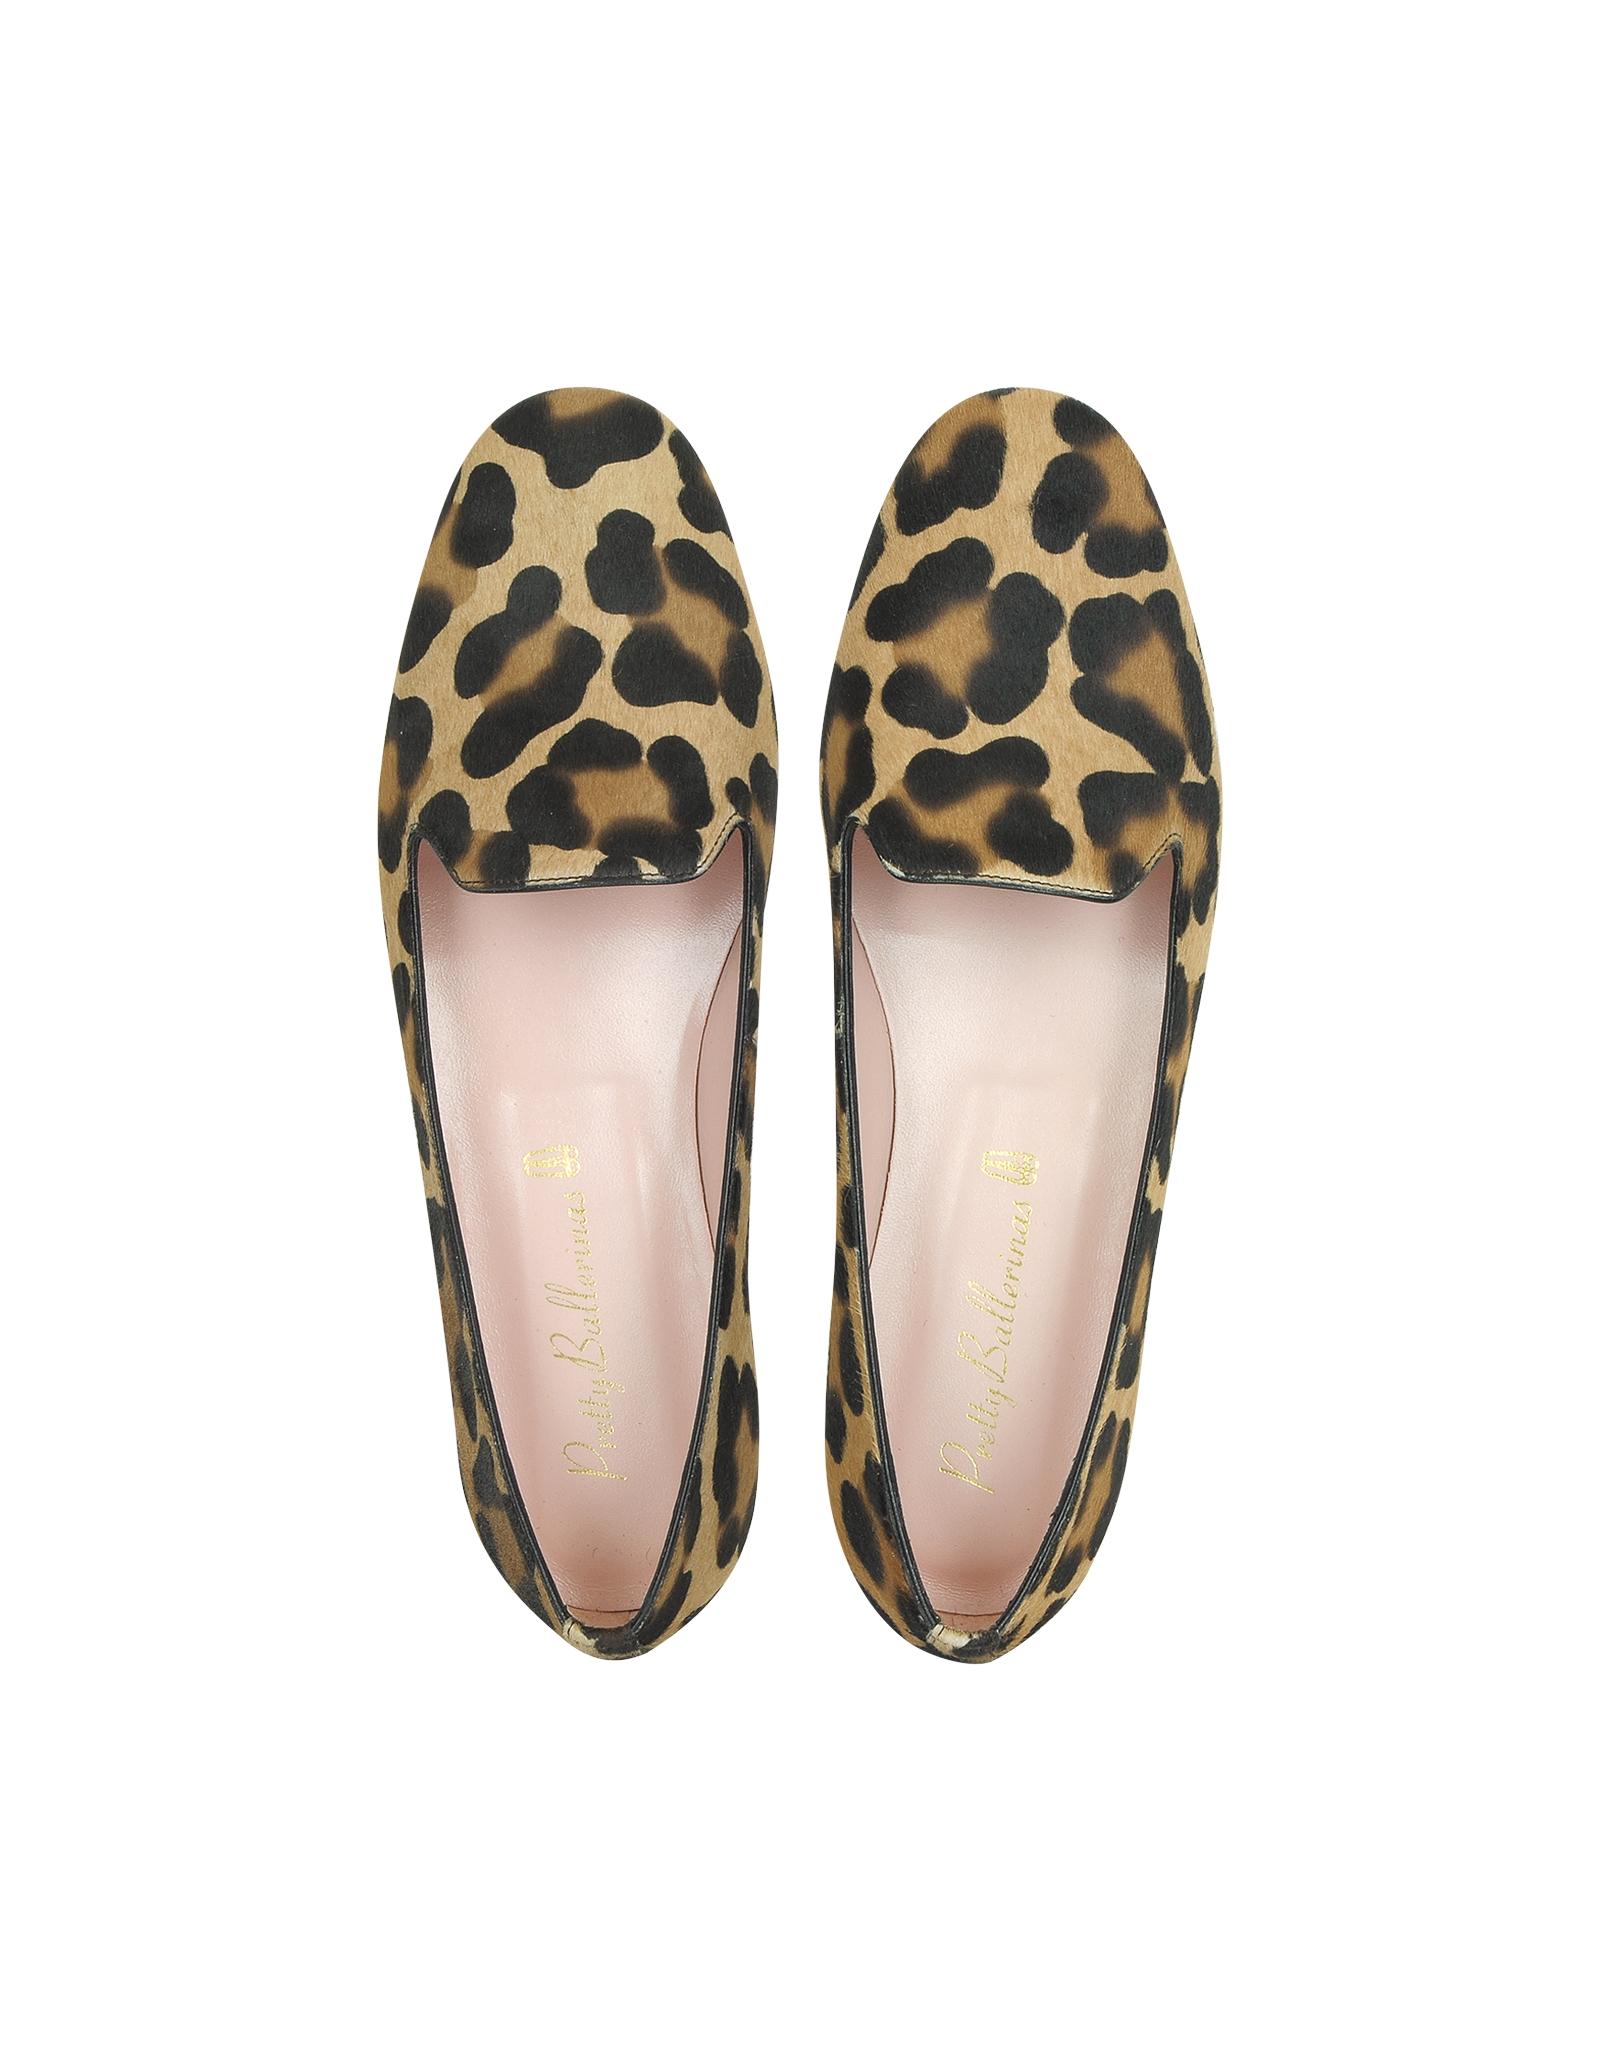 Lyst Pretty Ballerinas Faye Leopard Print Ponyhair